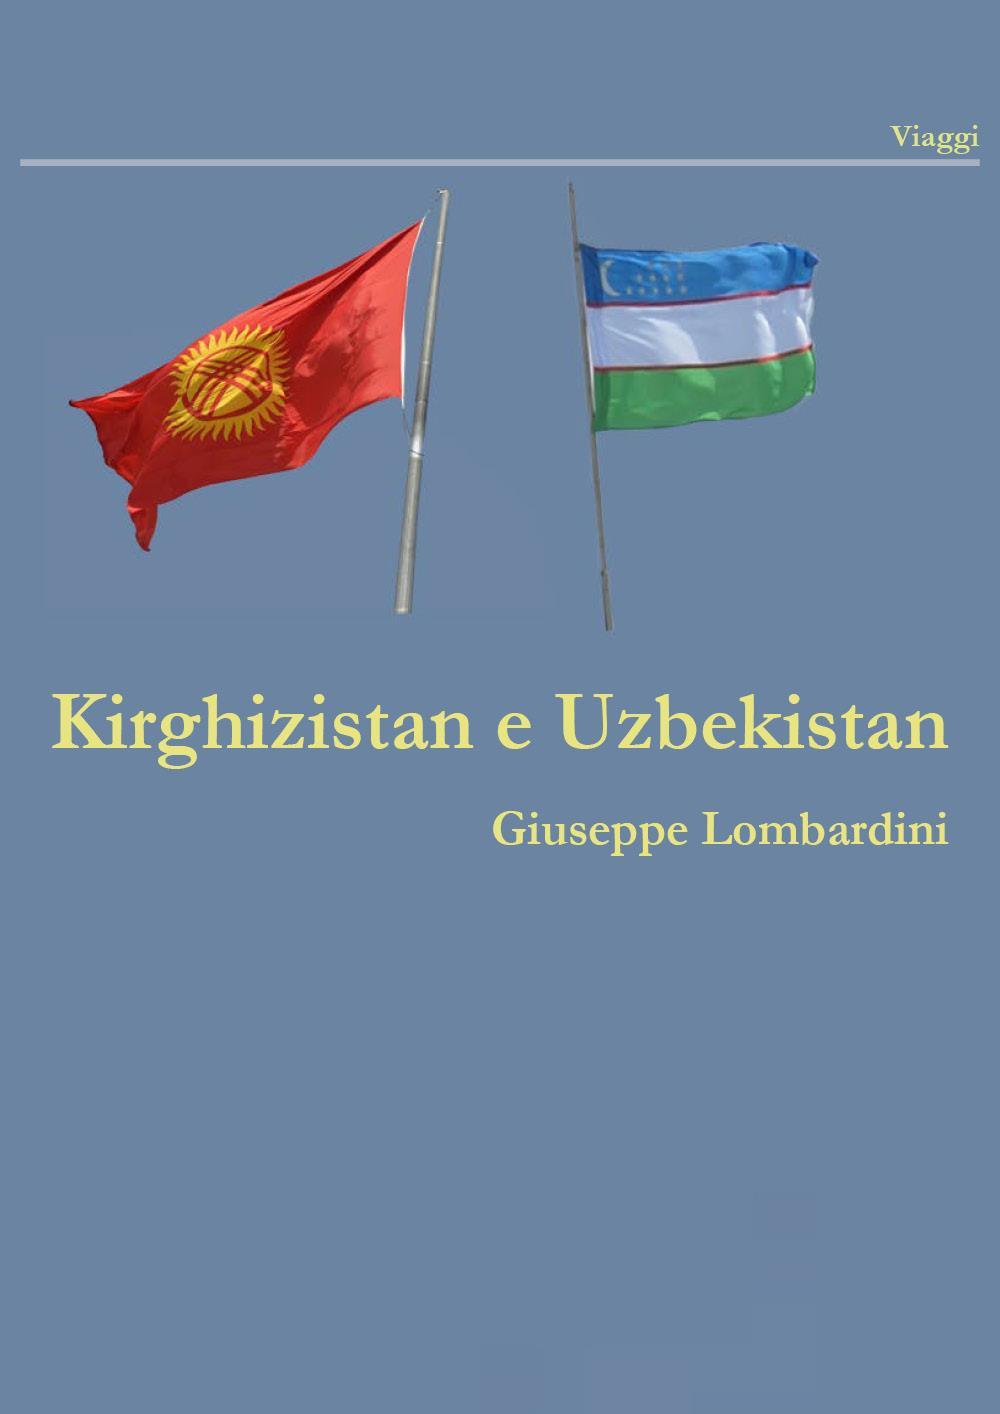 Kirghizistan e Uzbekistan